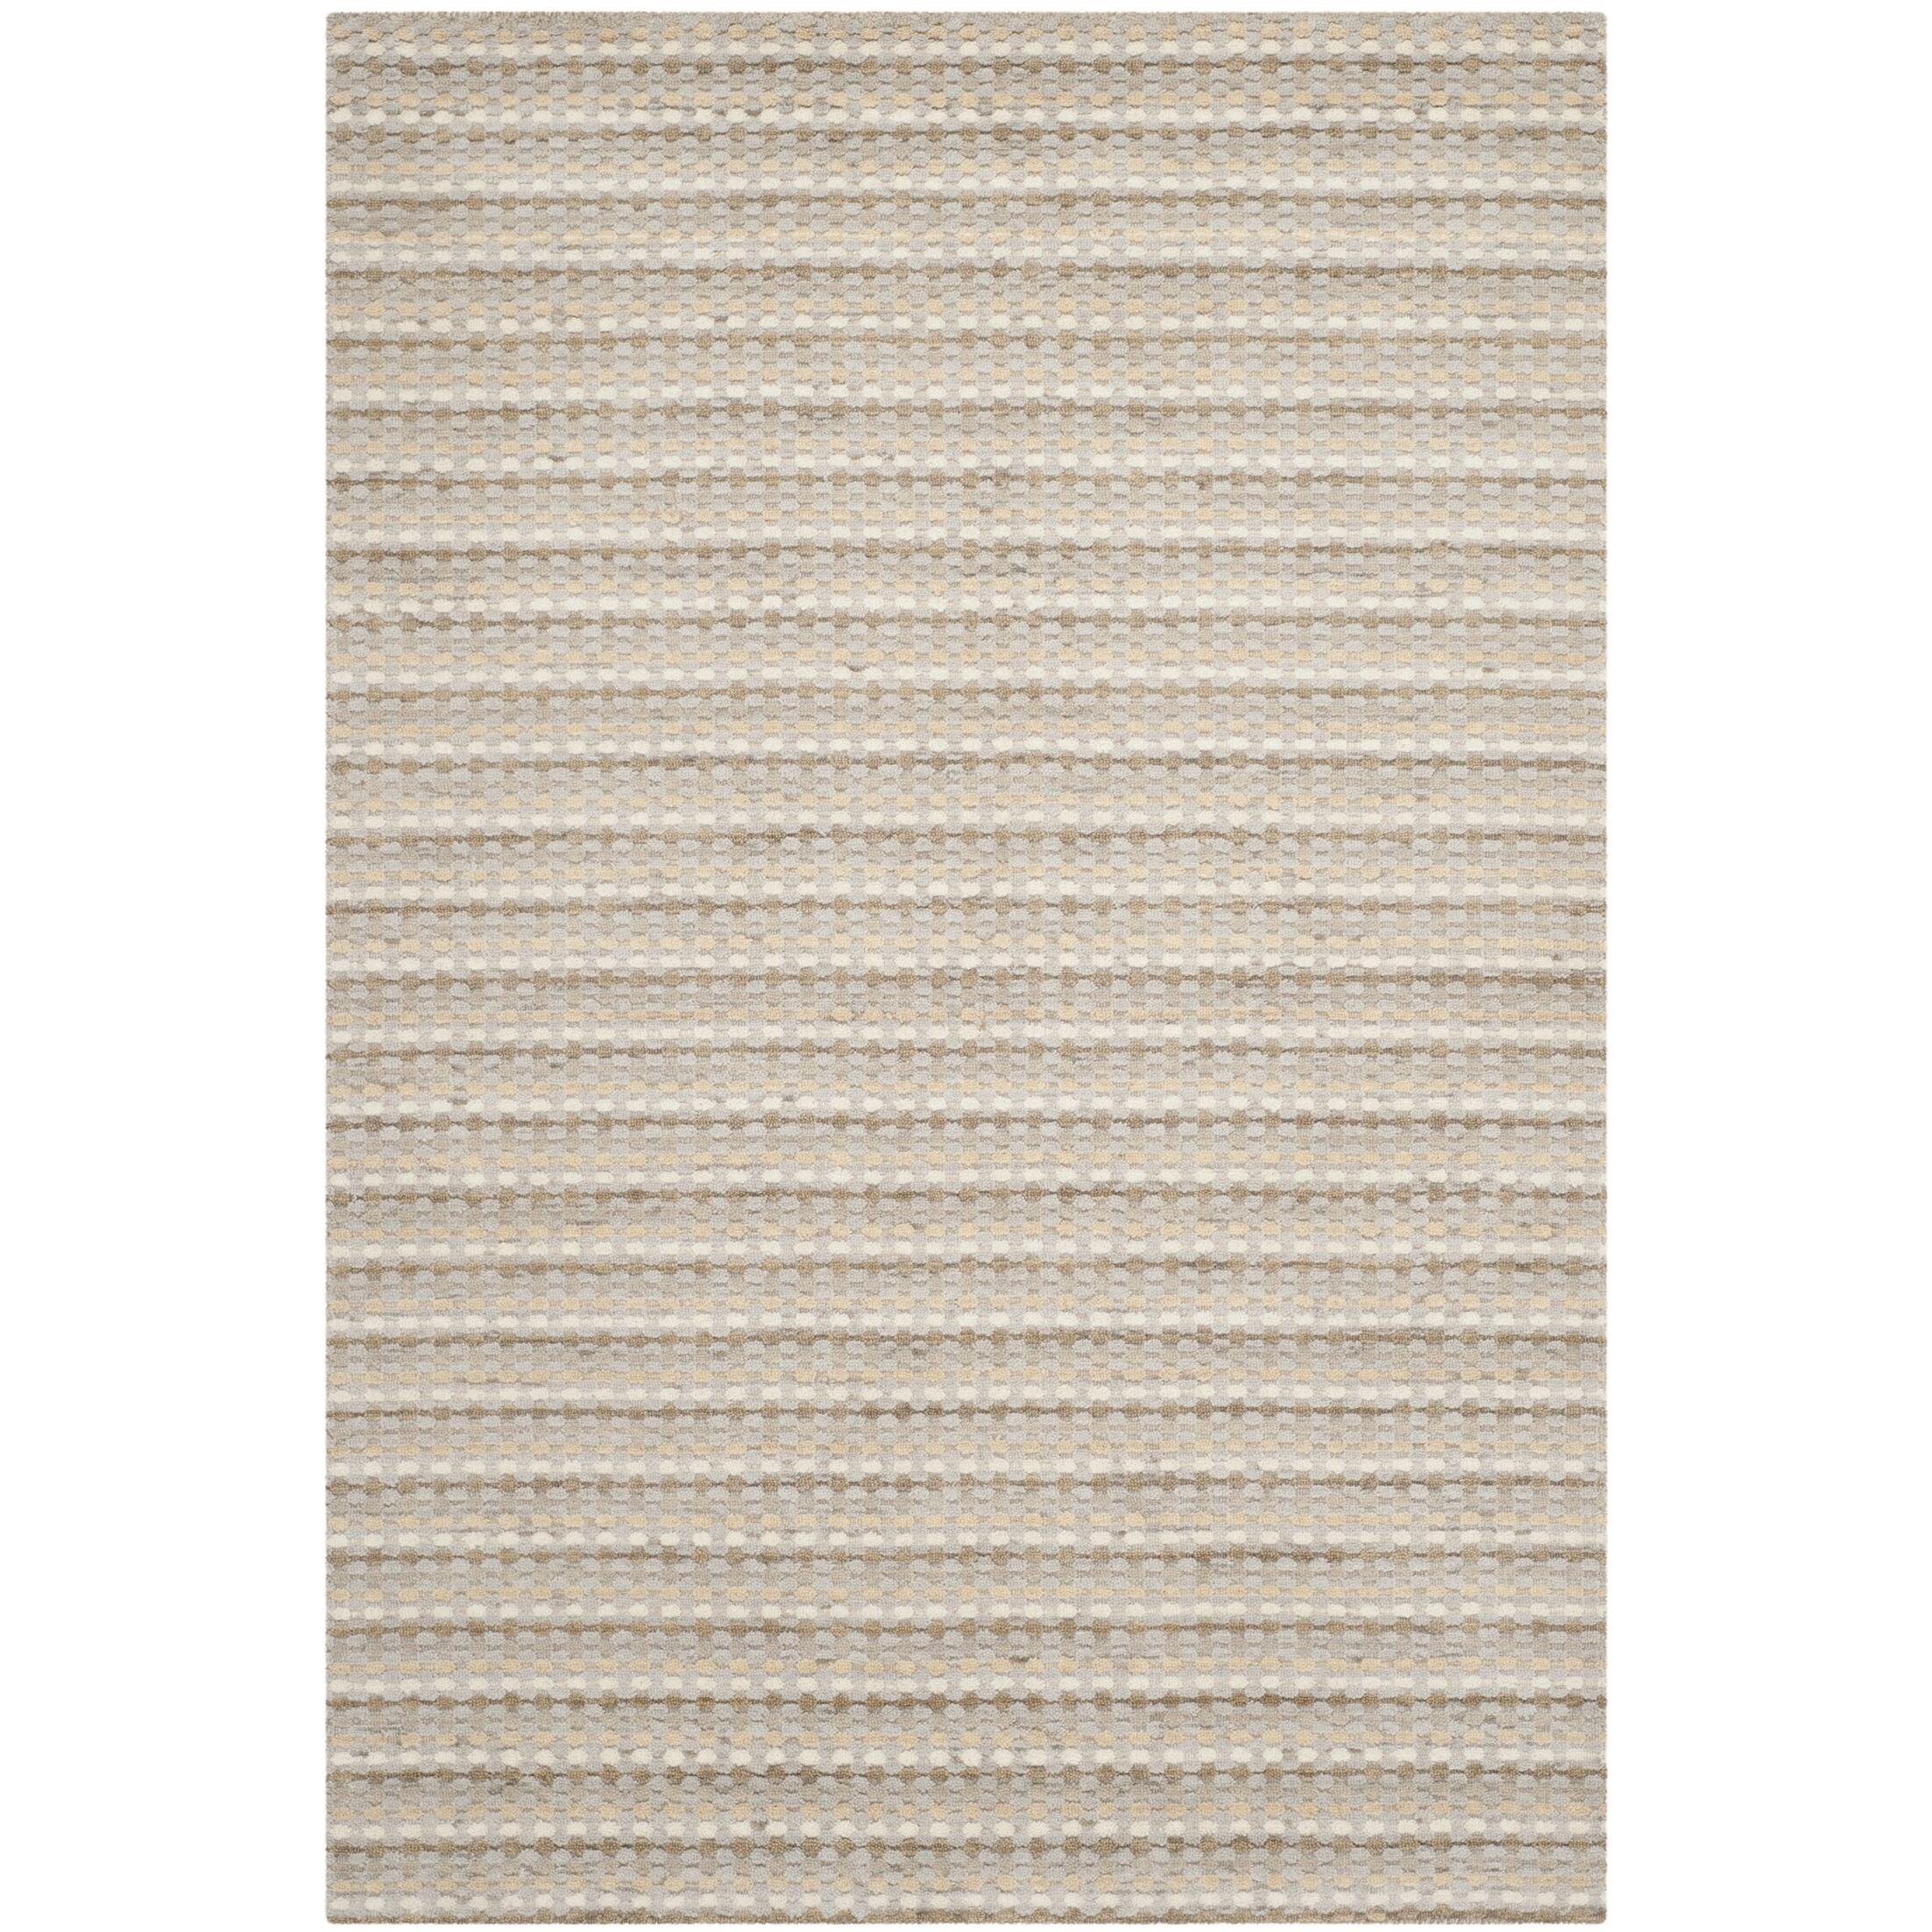 Keith Beige Stripe Area Rug Rug Size: Rectangle 4' x 6'